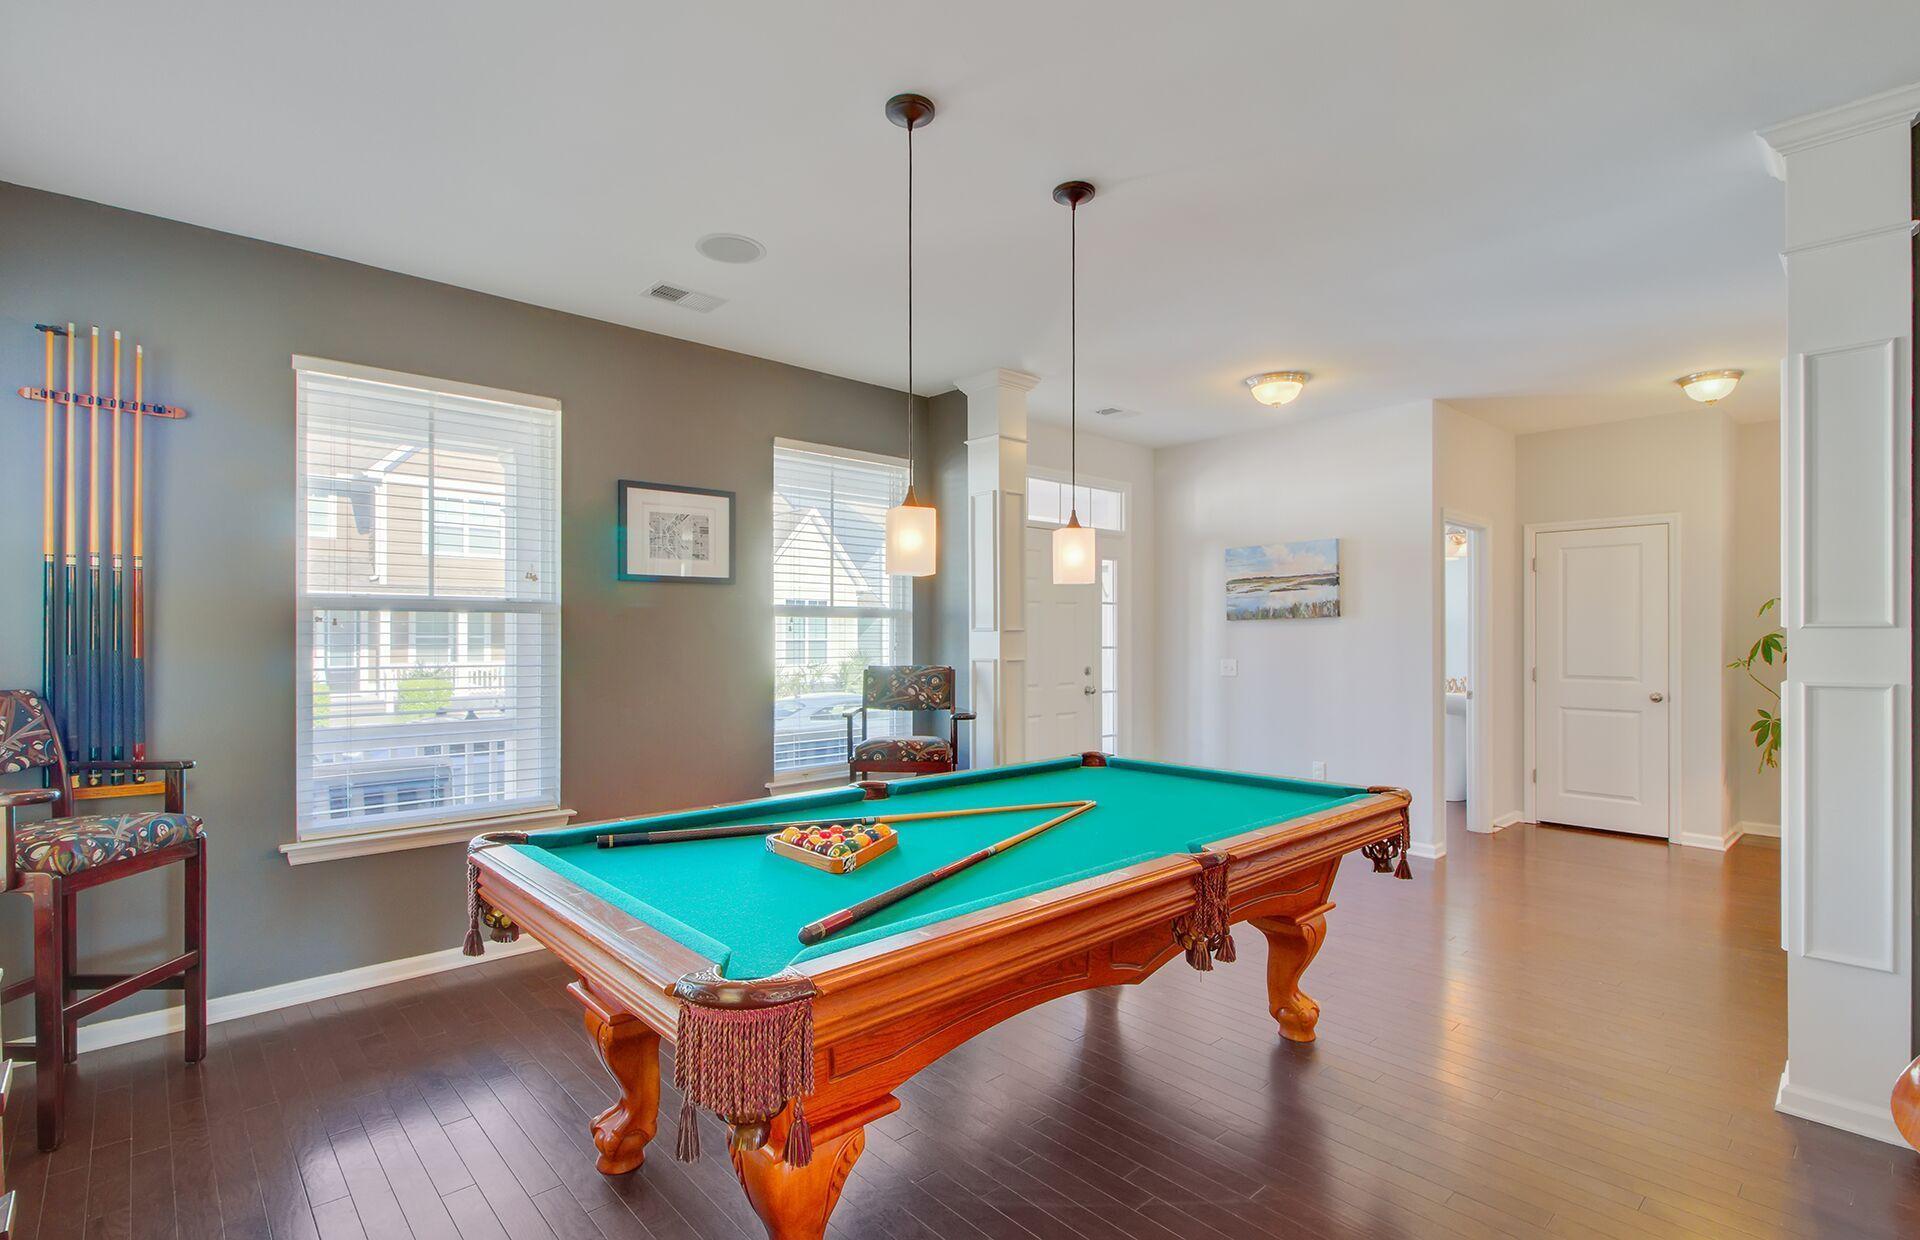 Oak Terrace Preserve Homes For Sale - 4967 Liberty Park, North Charleston, SC - 6